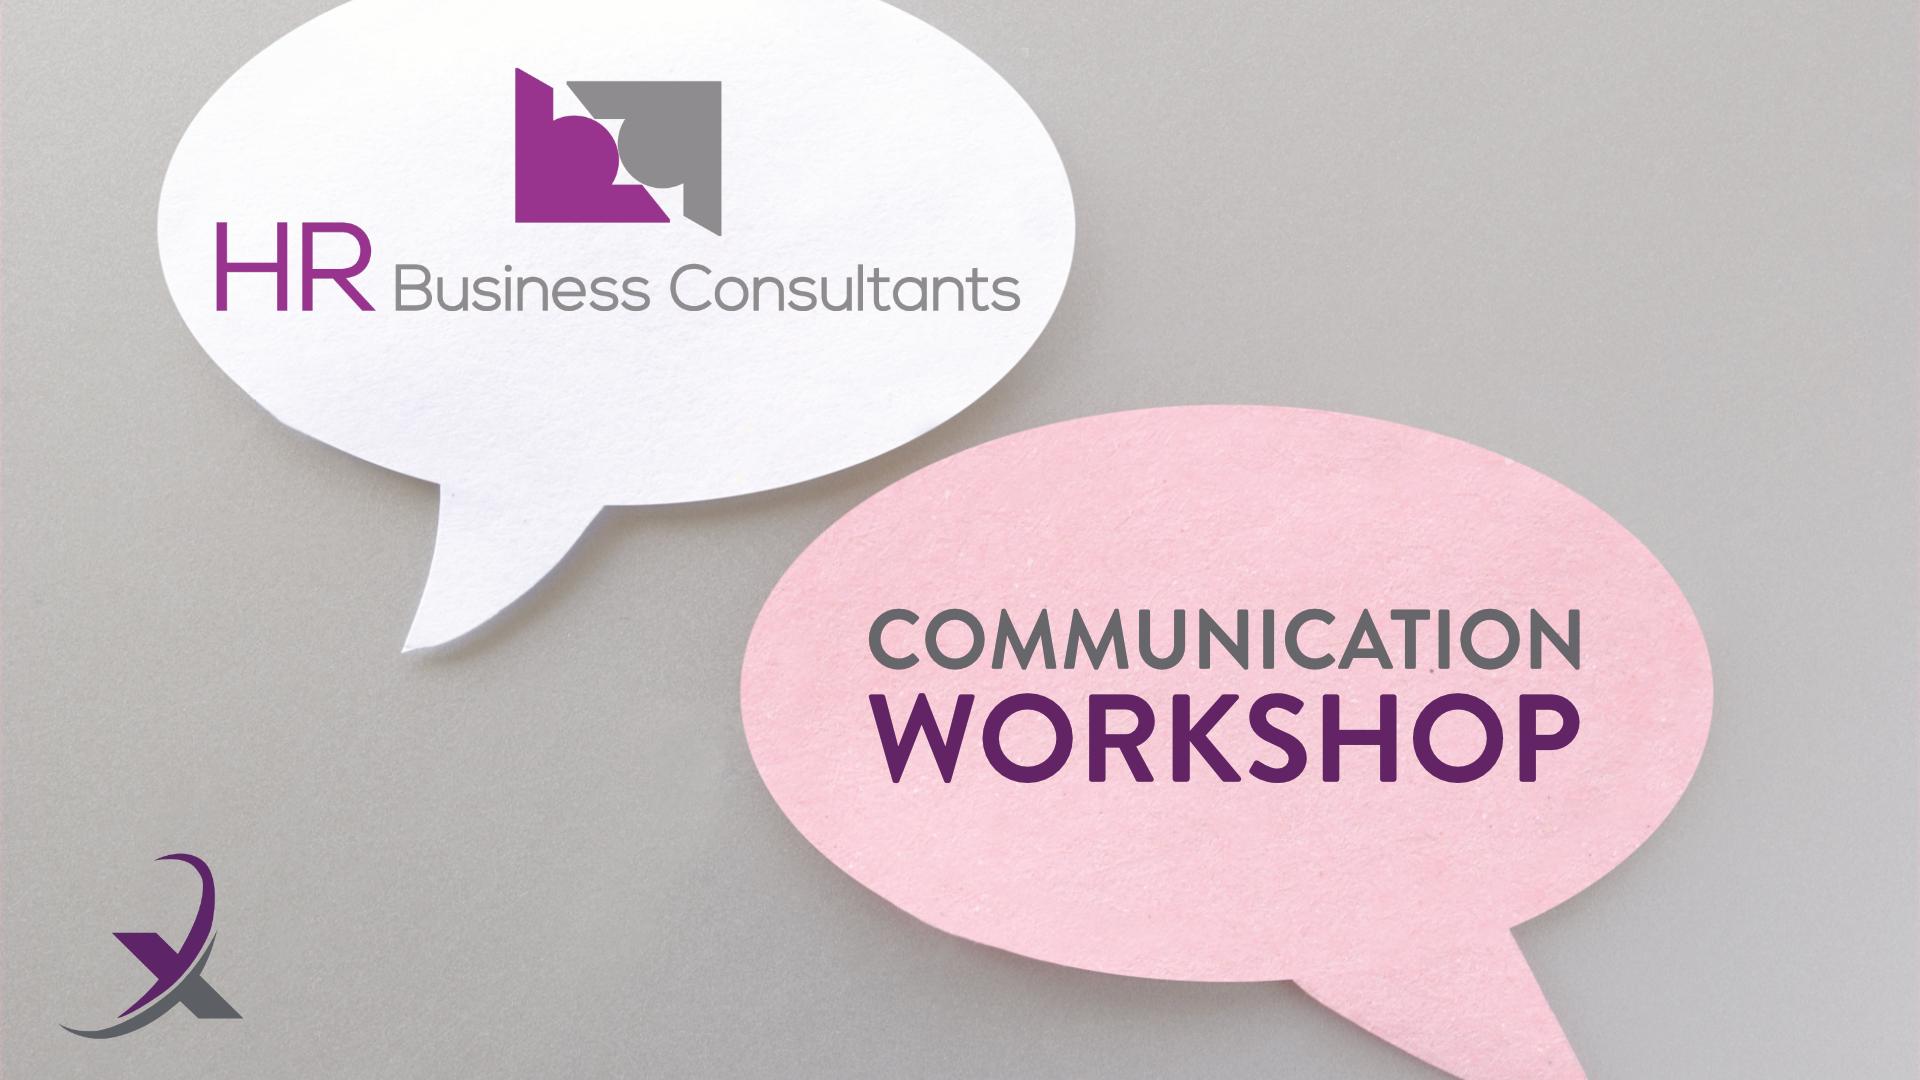 Communication in business workshop